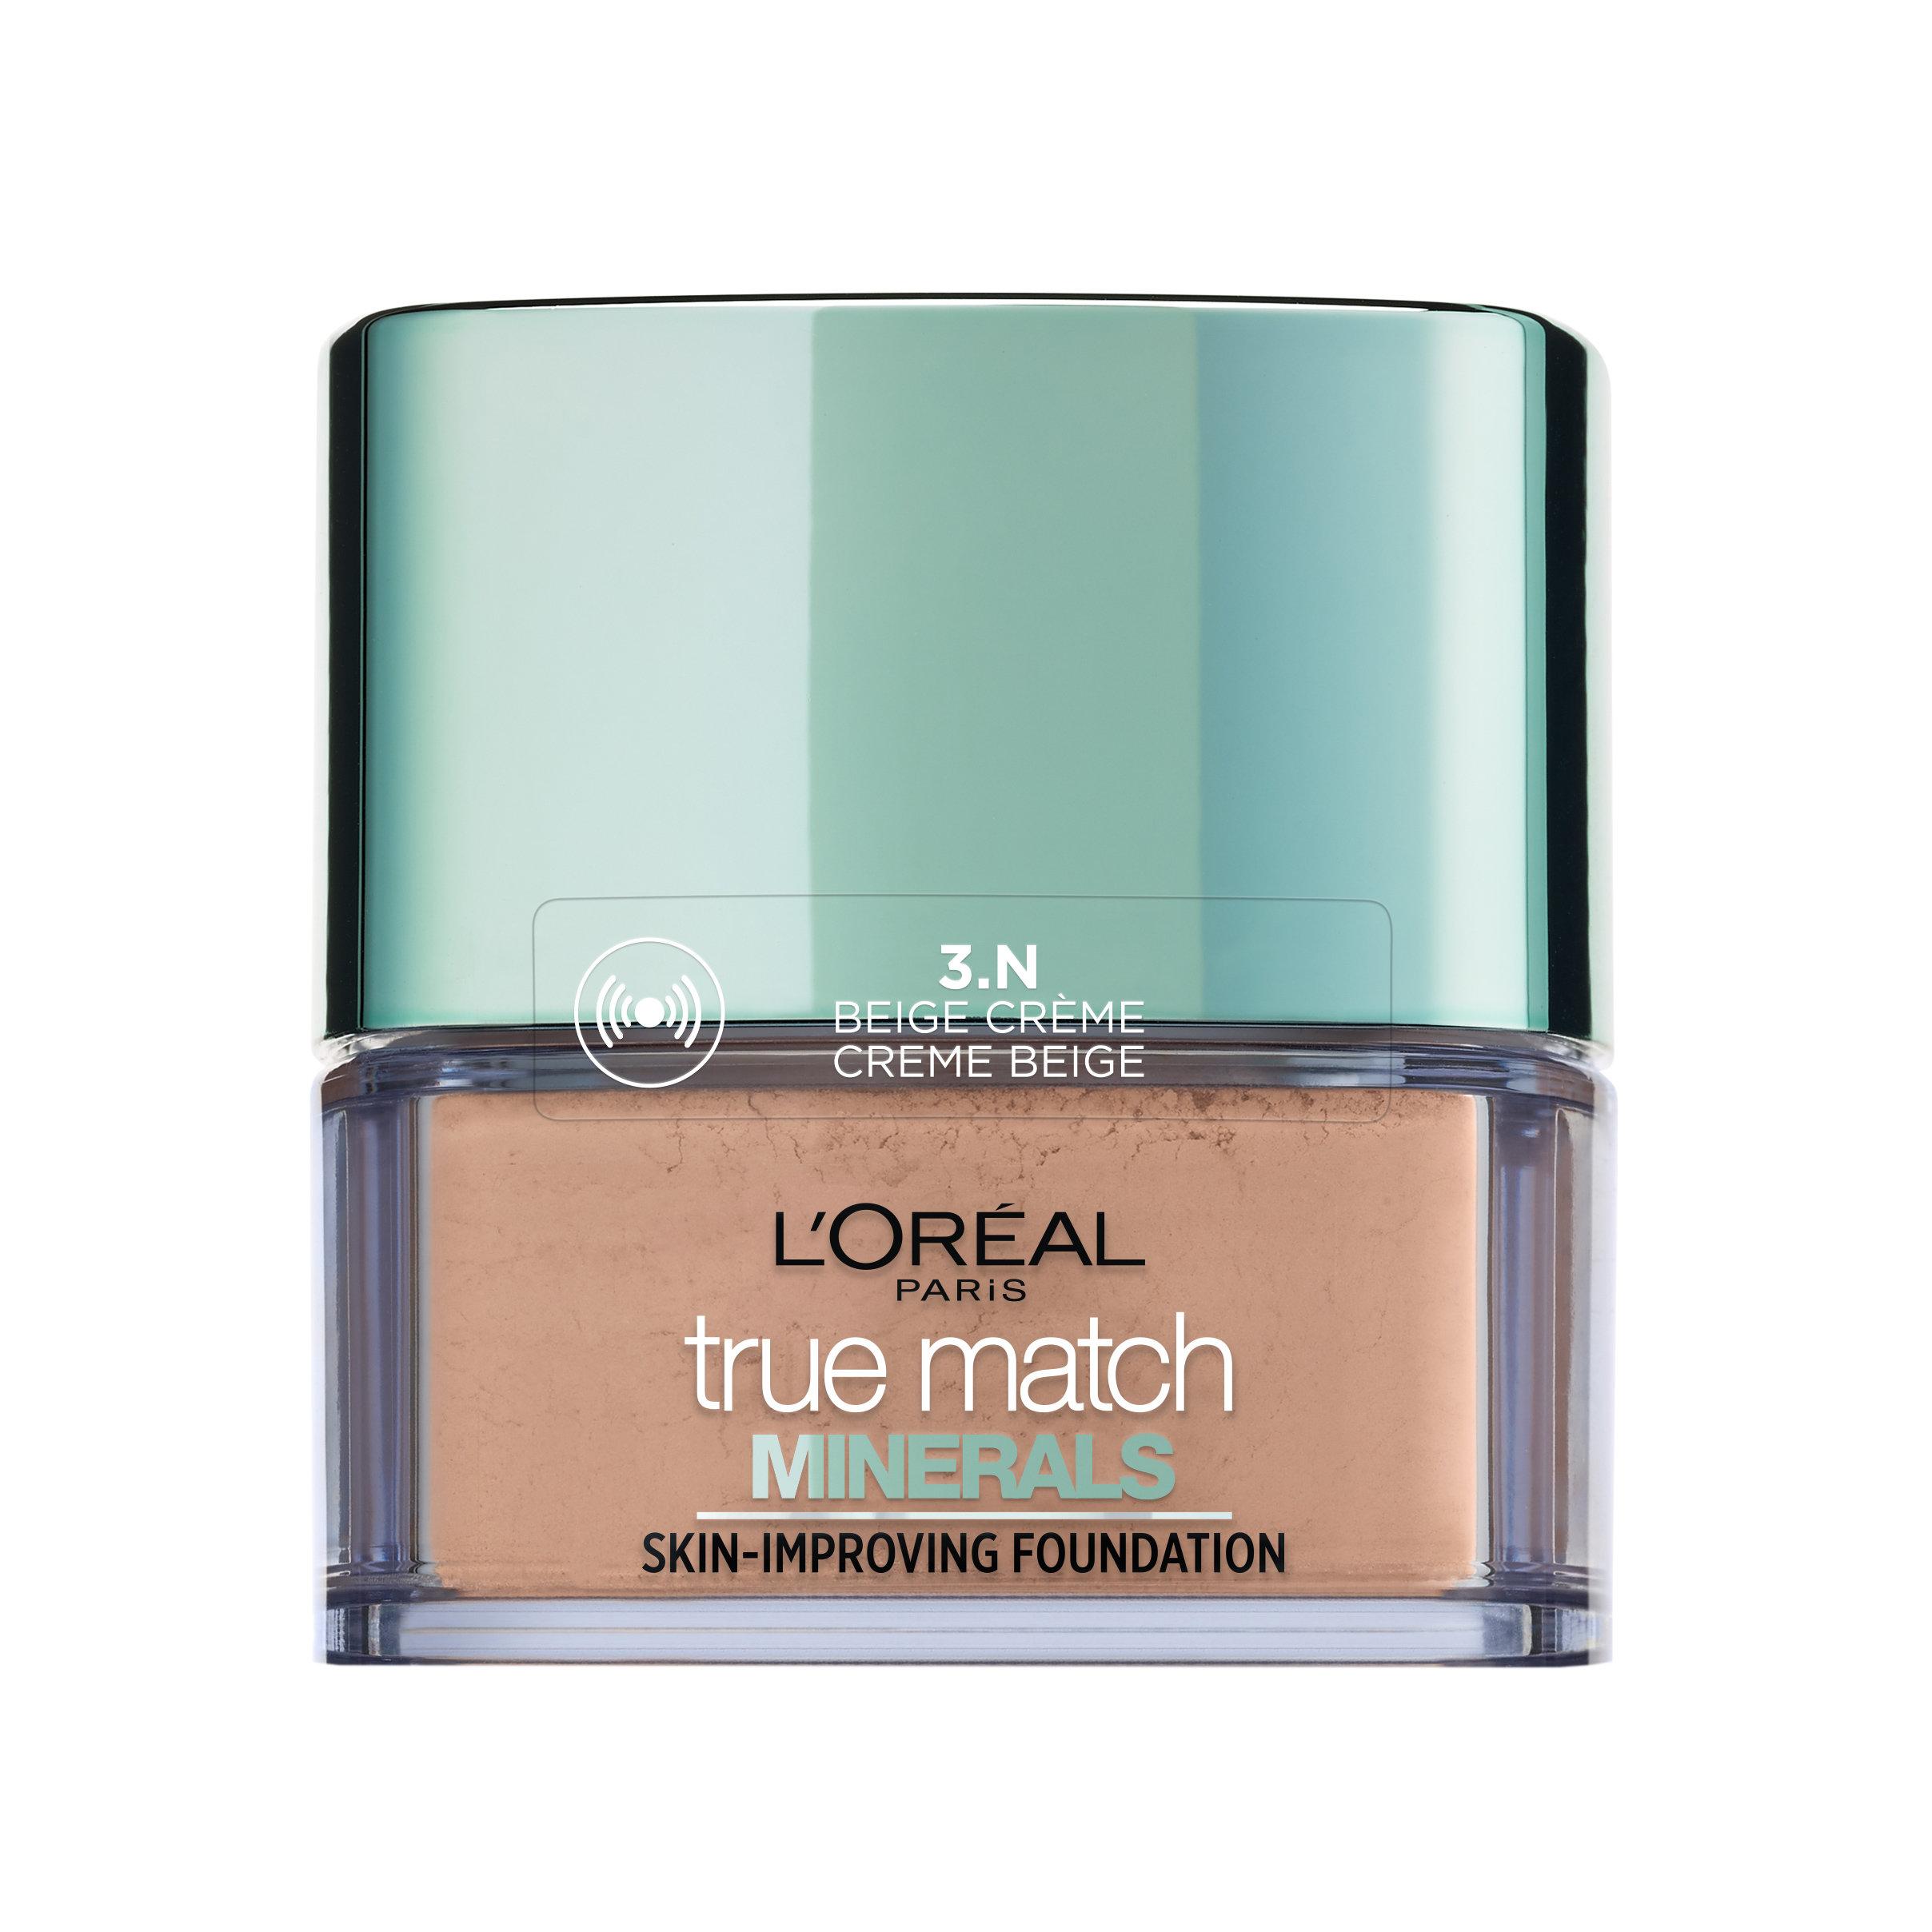 Mineralinis makiažo pagrindas L'Oreal Paris True Match 10 g